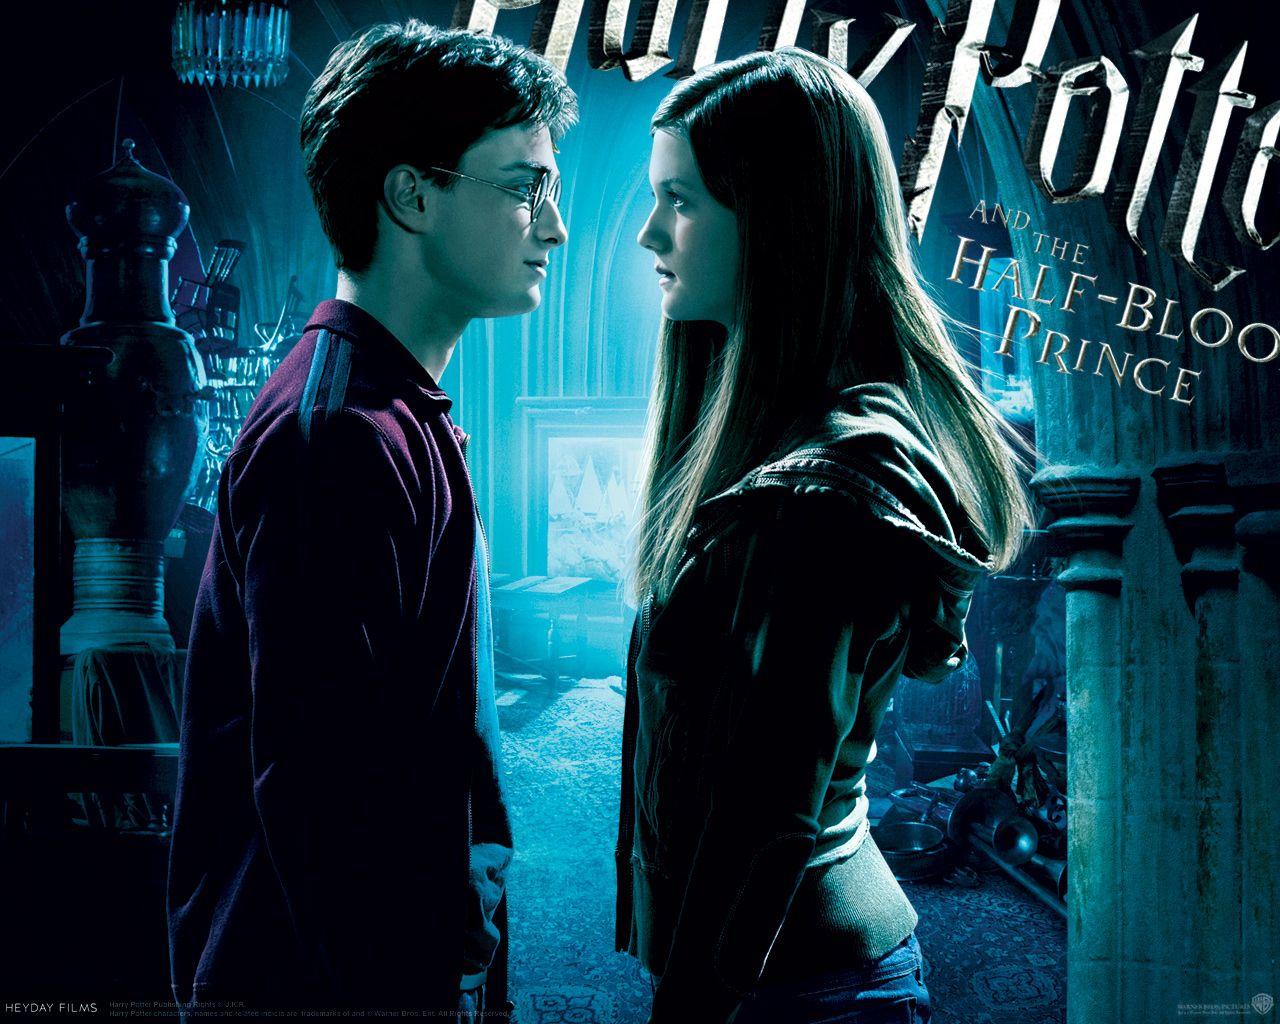 Must see Wallpaper Harry Potter Artsy - d7f67f284618fbd82cdecbf8dab7ee8b  Collection_988799.jpg